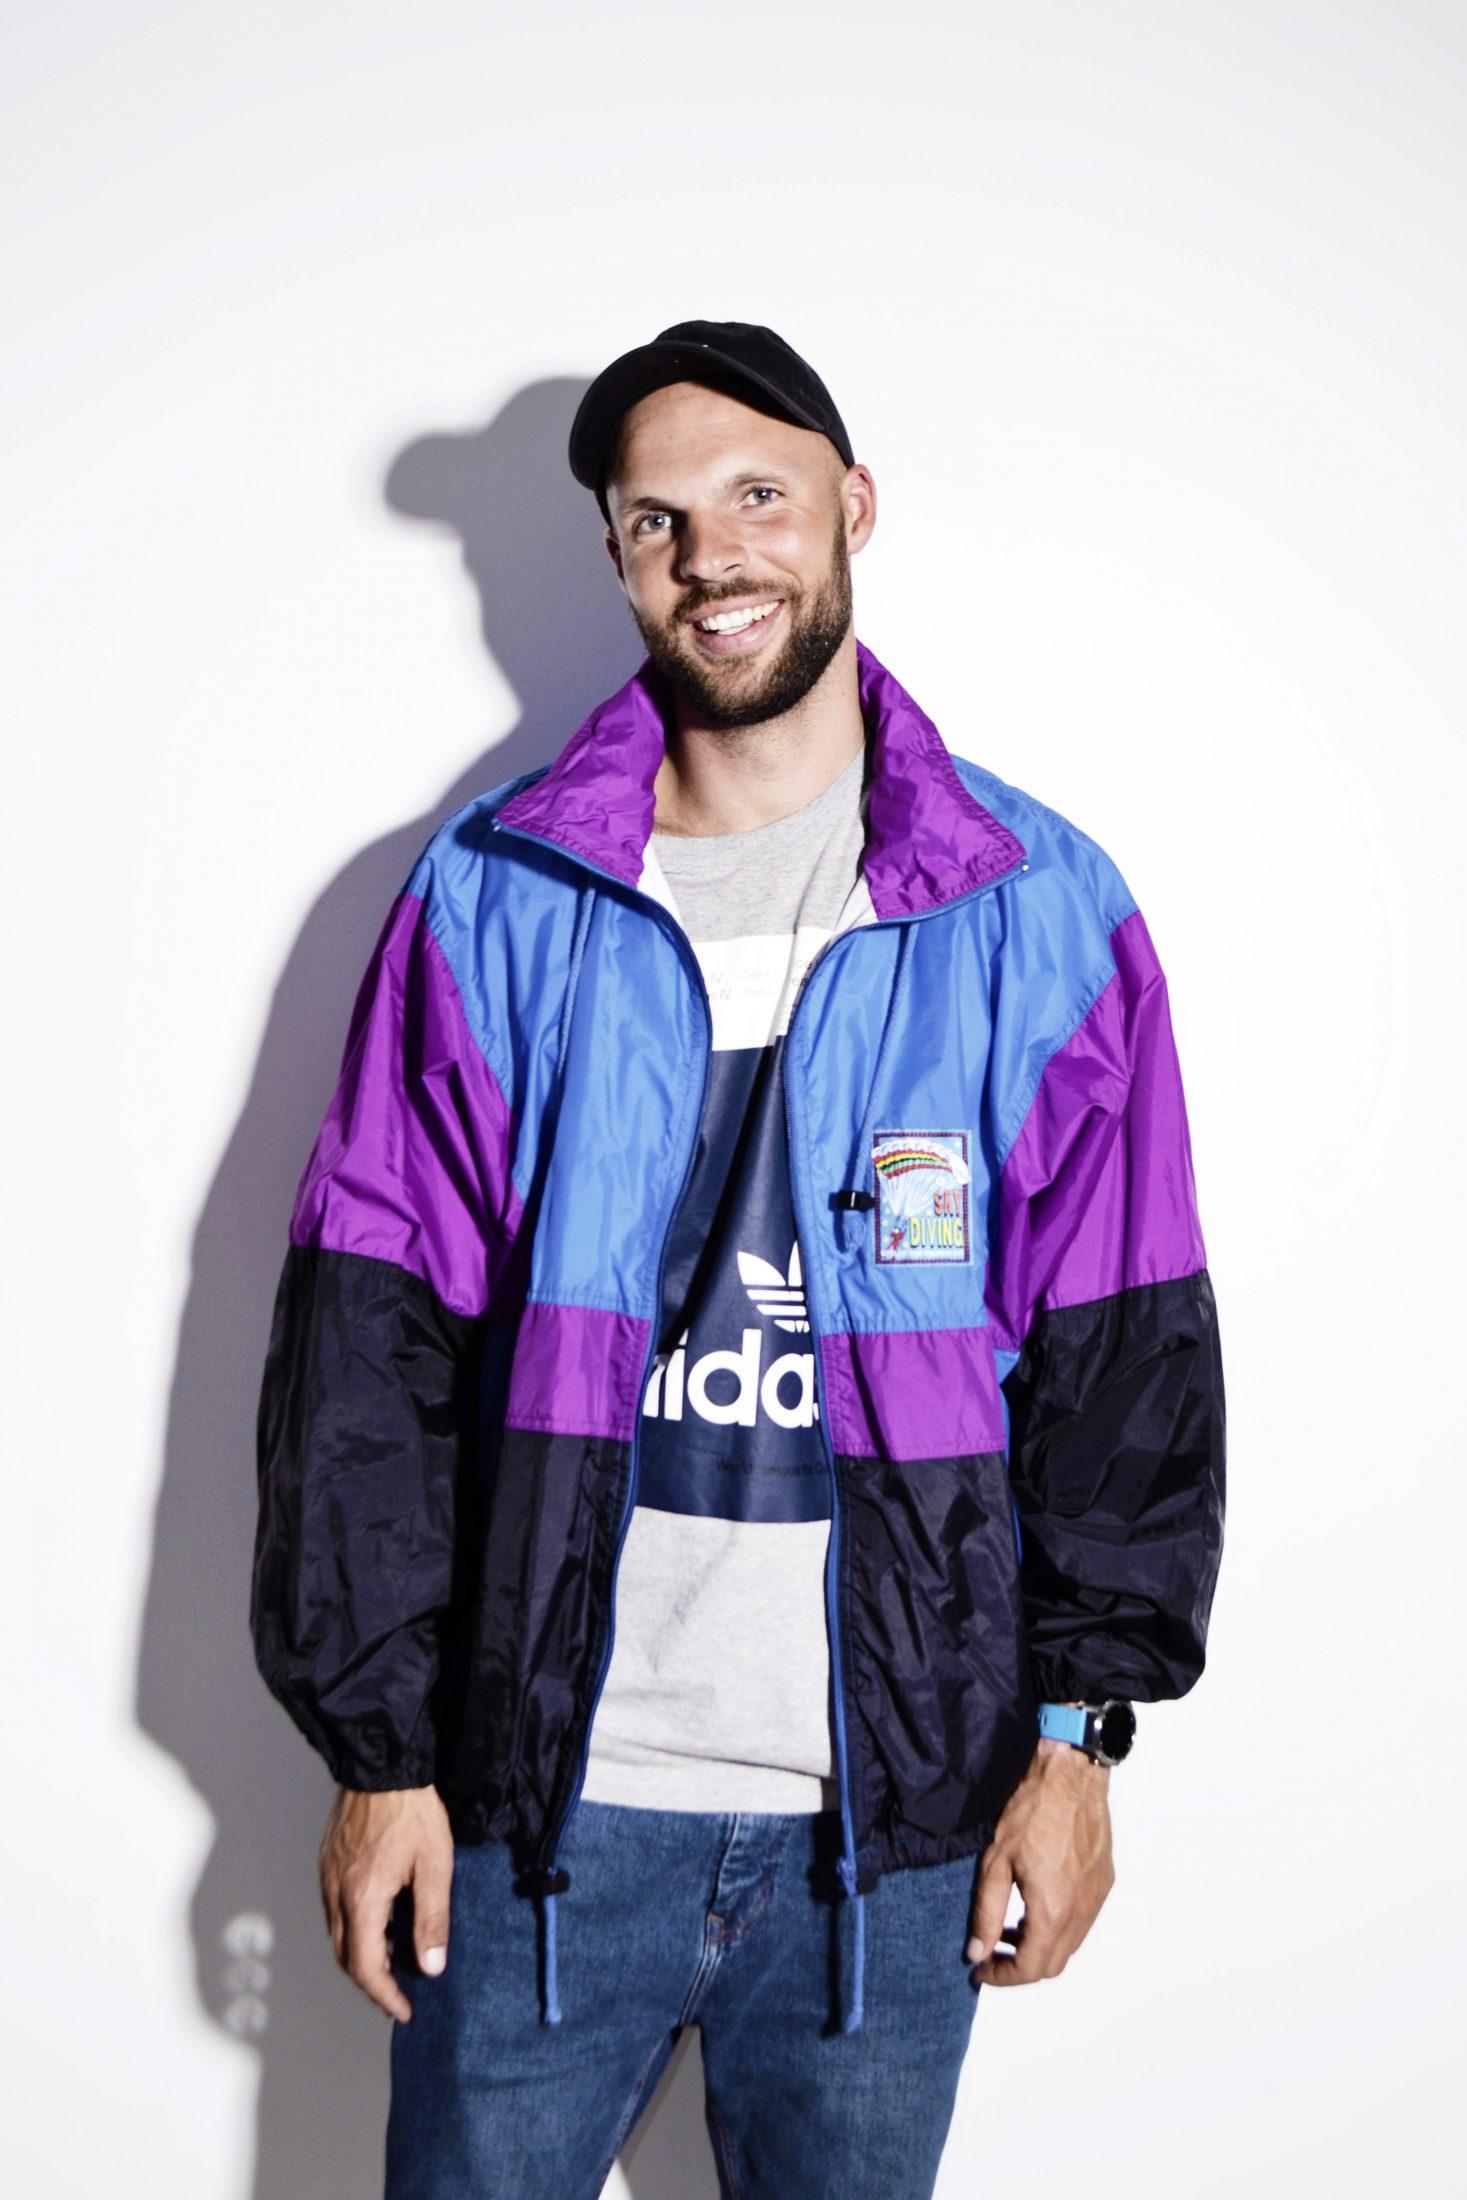 56157cf3f Vintage red sport jacket men | HOT MILK 90's streetwear online